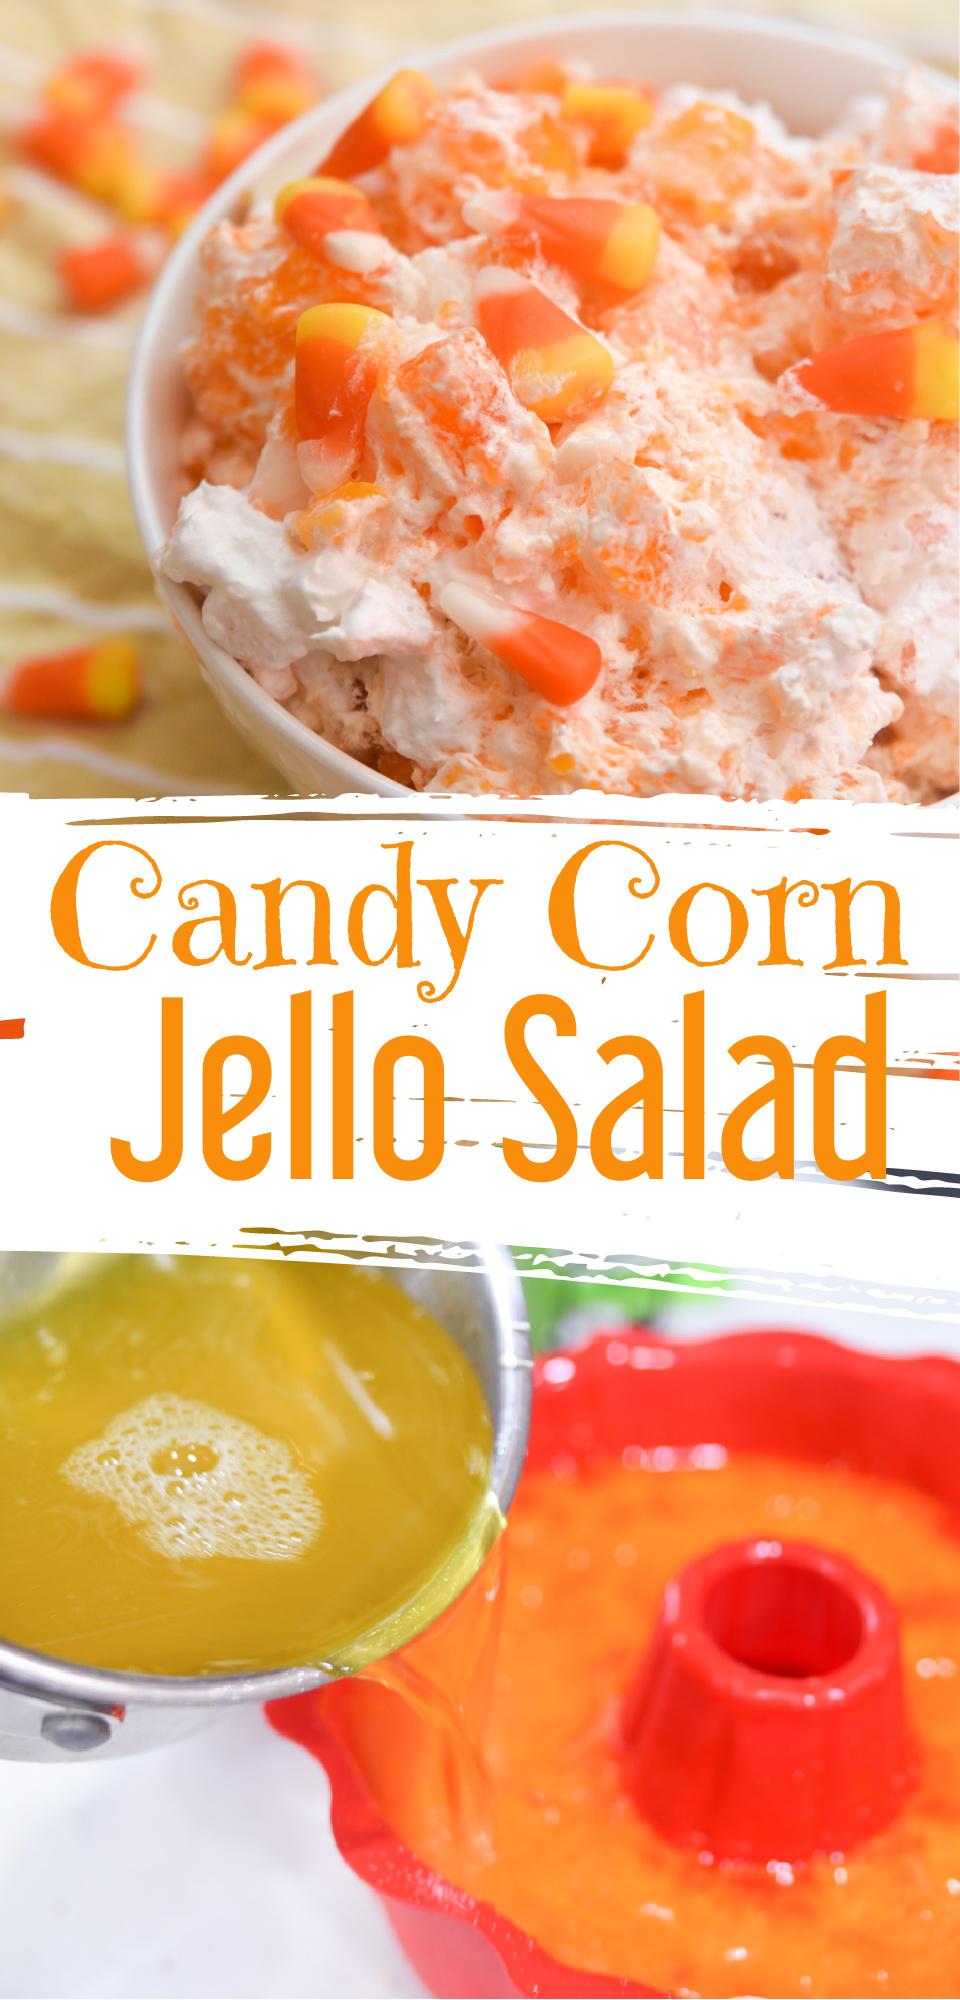 Candy Corn Jello Salad (perfect for Halloween!) via @simplysidedishes89